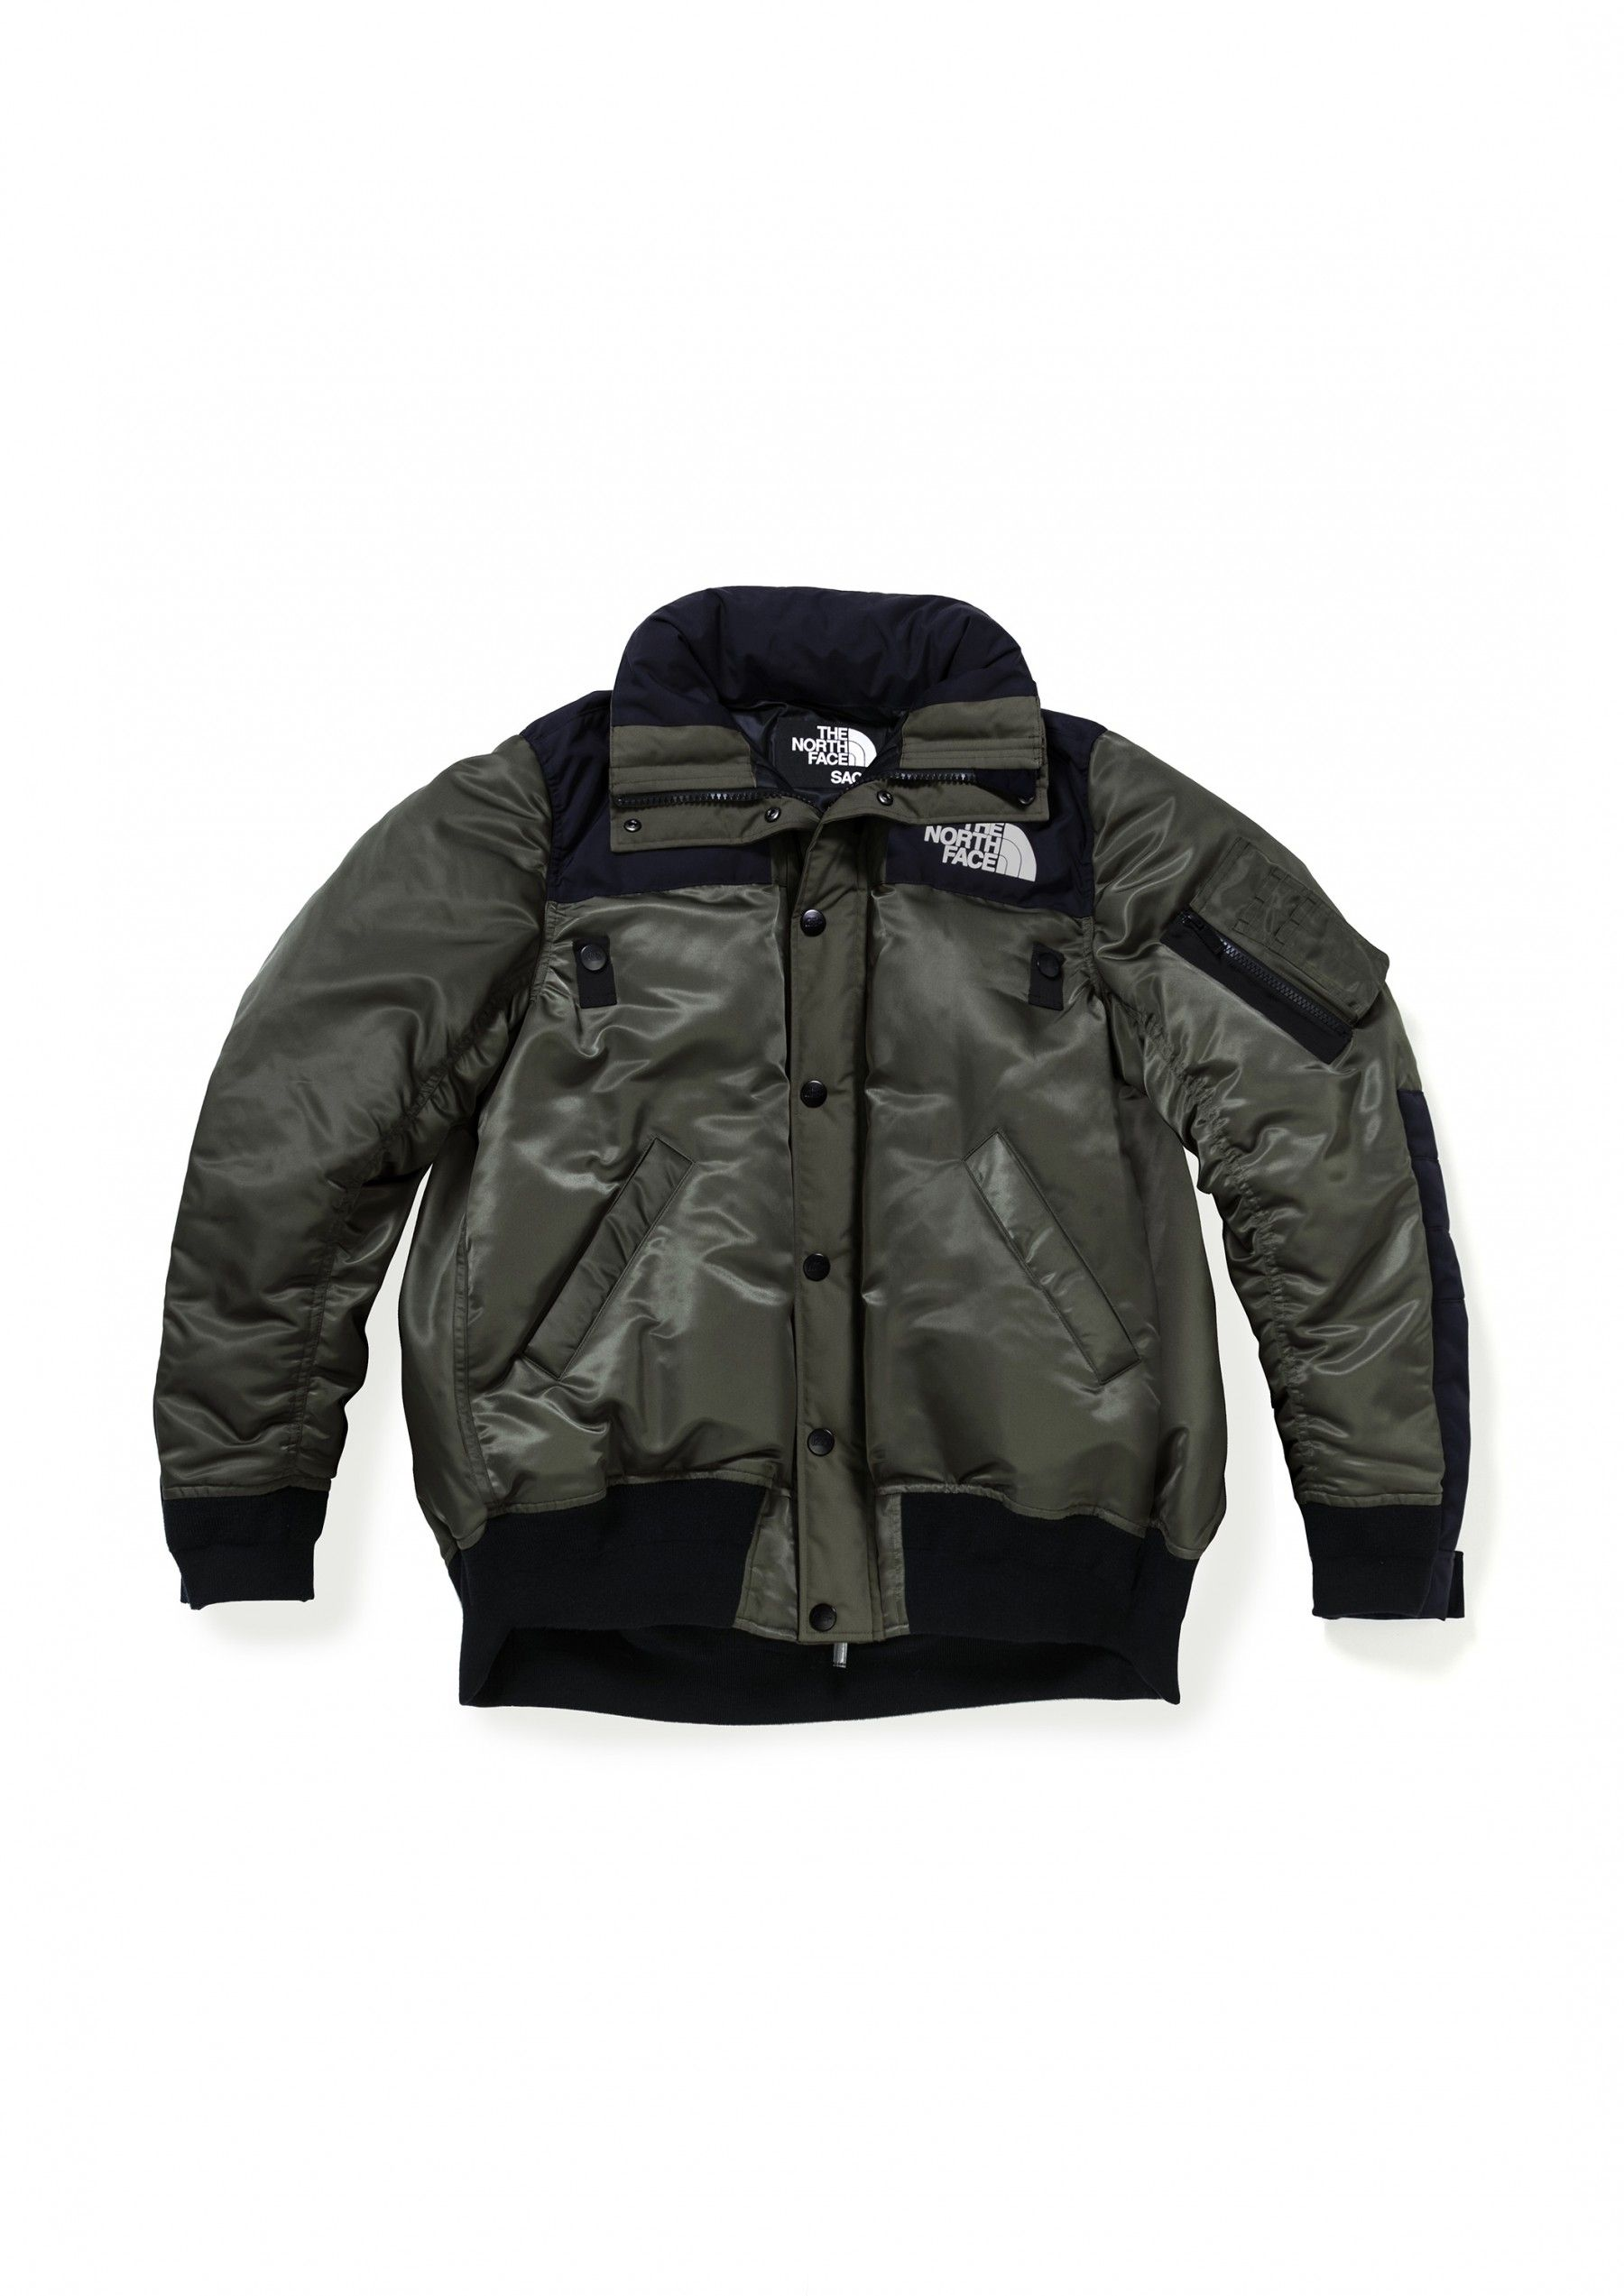 264aebdee Sacai x The North Face Men's Bomber Jacket (Khaki) | Gorpcore ...